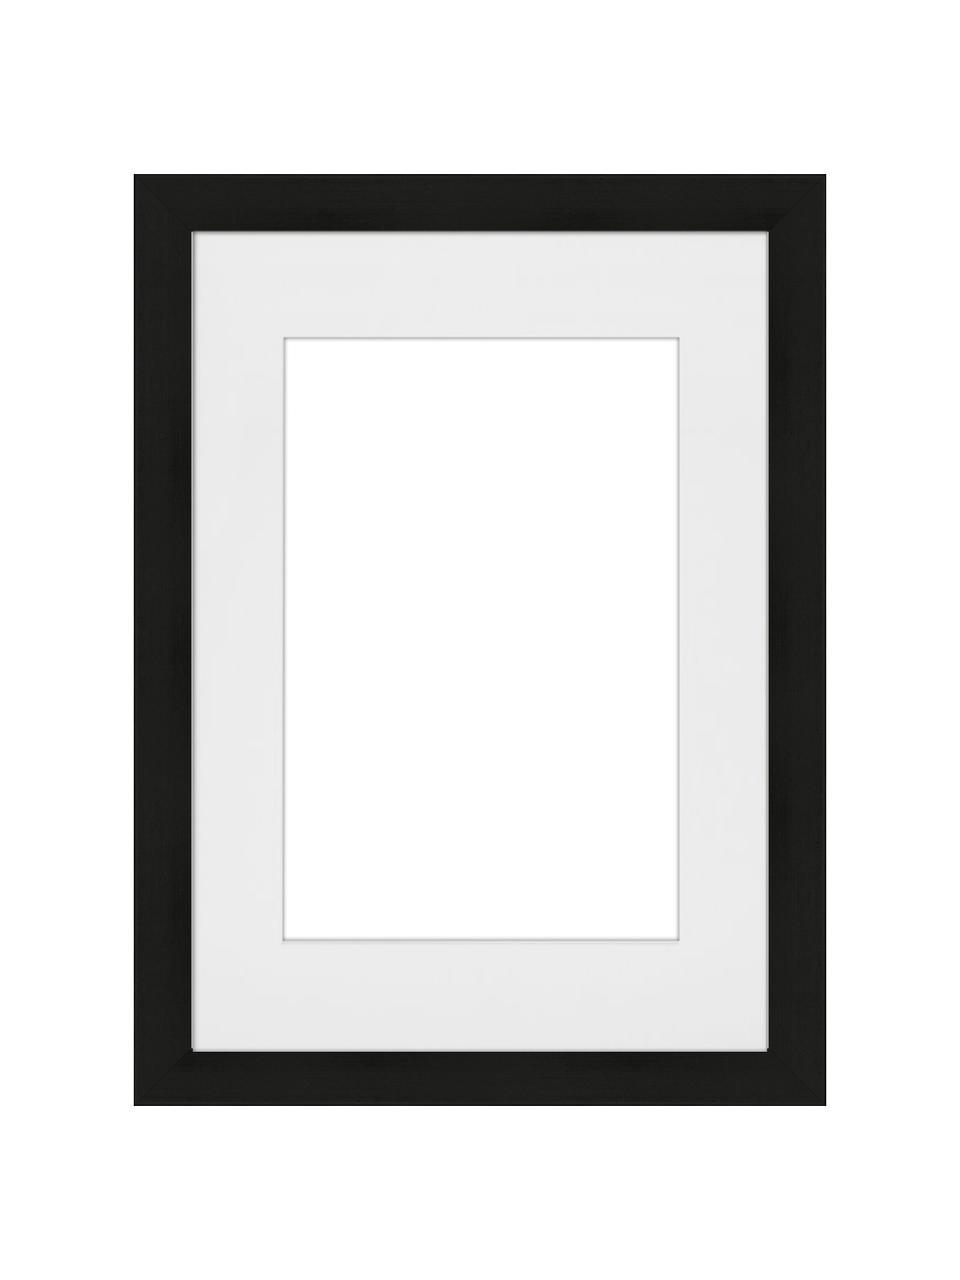 Bilderrahmen Apollon, Rahmen: Monterey-Kiefernholz, lac, Front: Glas, Rückseite: Mitteldichte Holzfaserpla, Schwarz, 21 x 30 cm